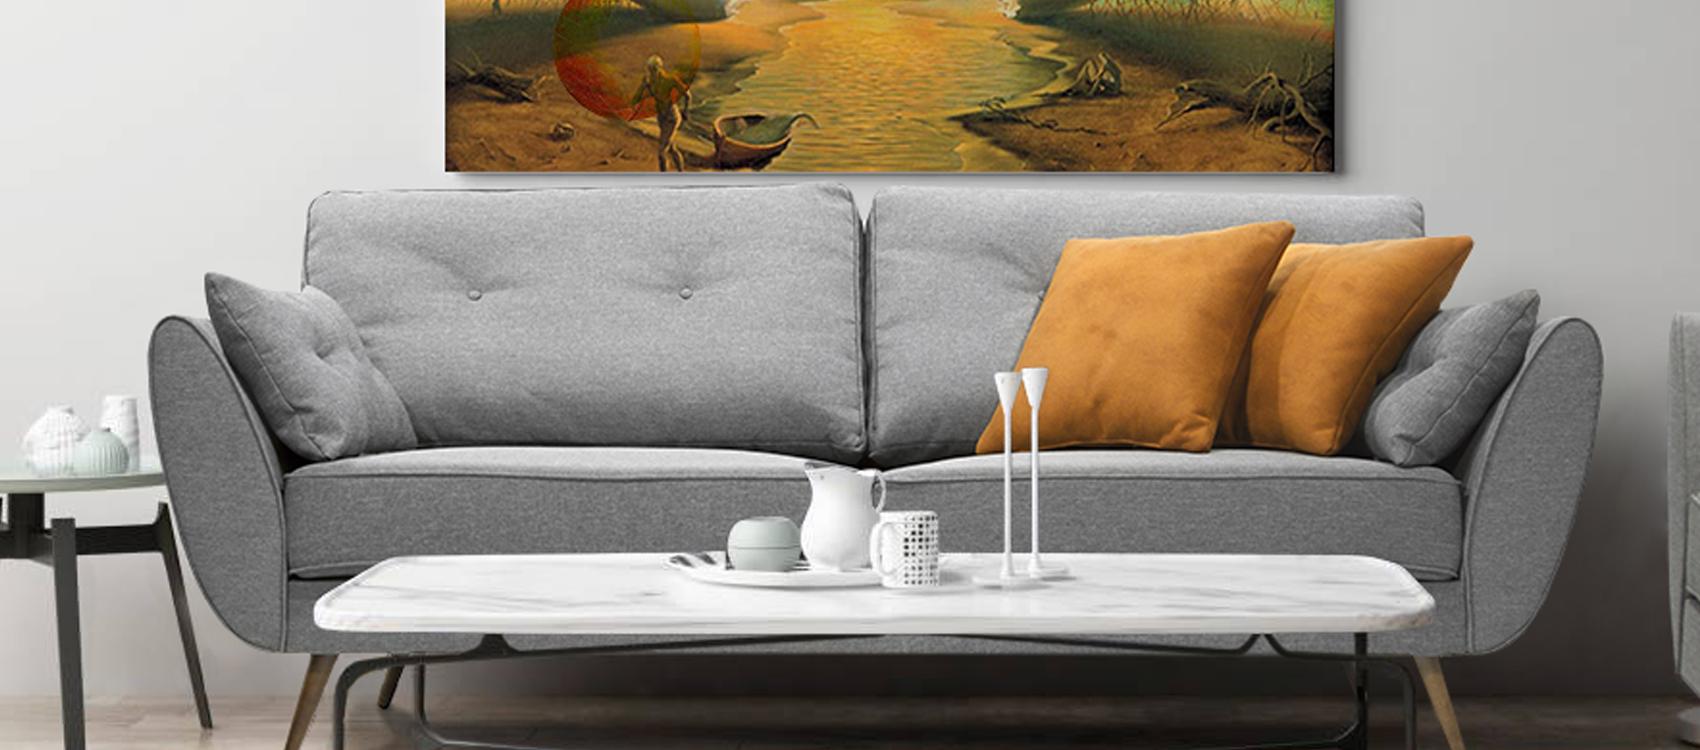 Sofa MALMO фото 1